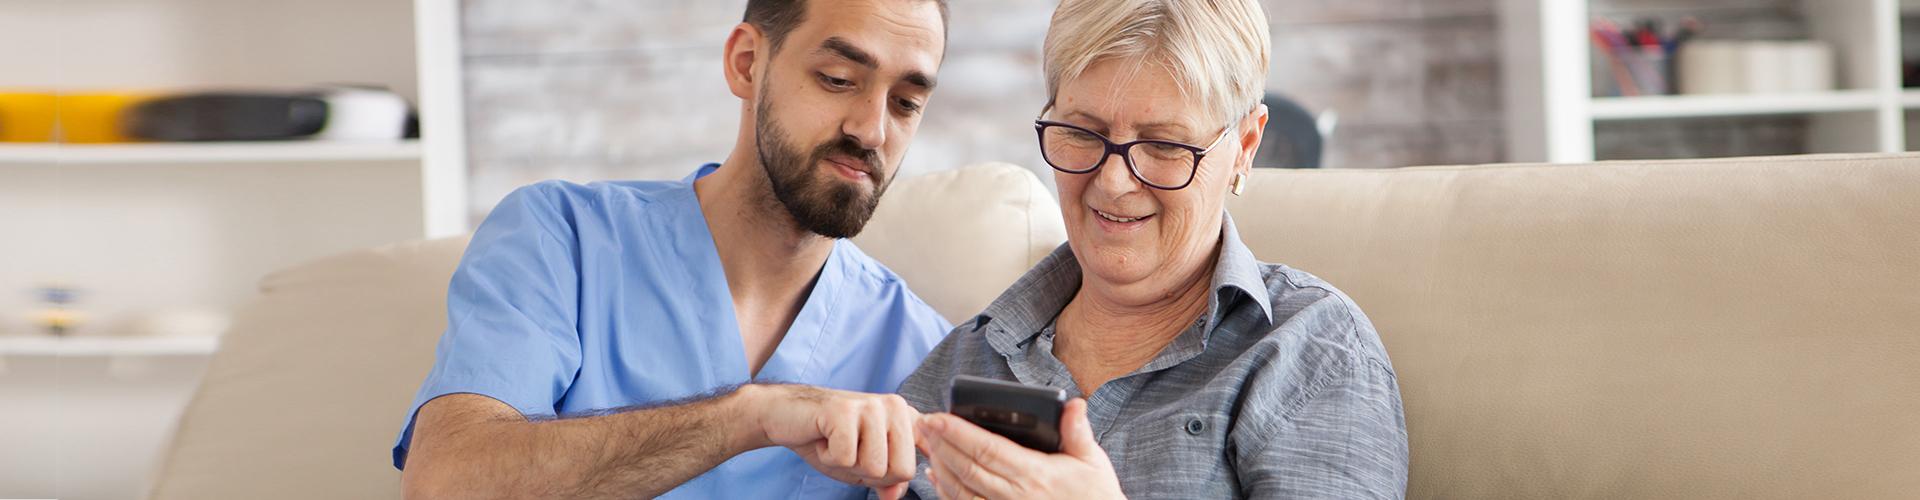 caretaker helping elder lady with phone